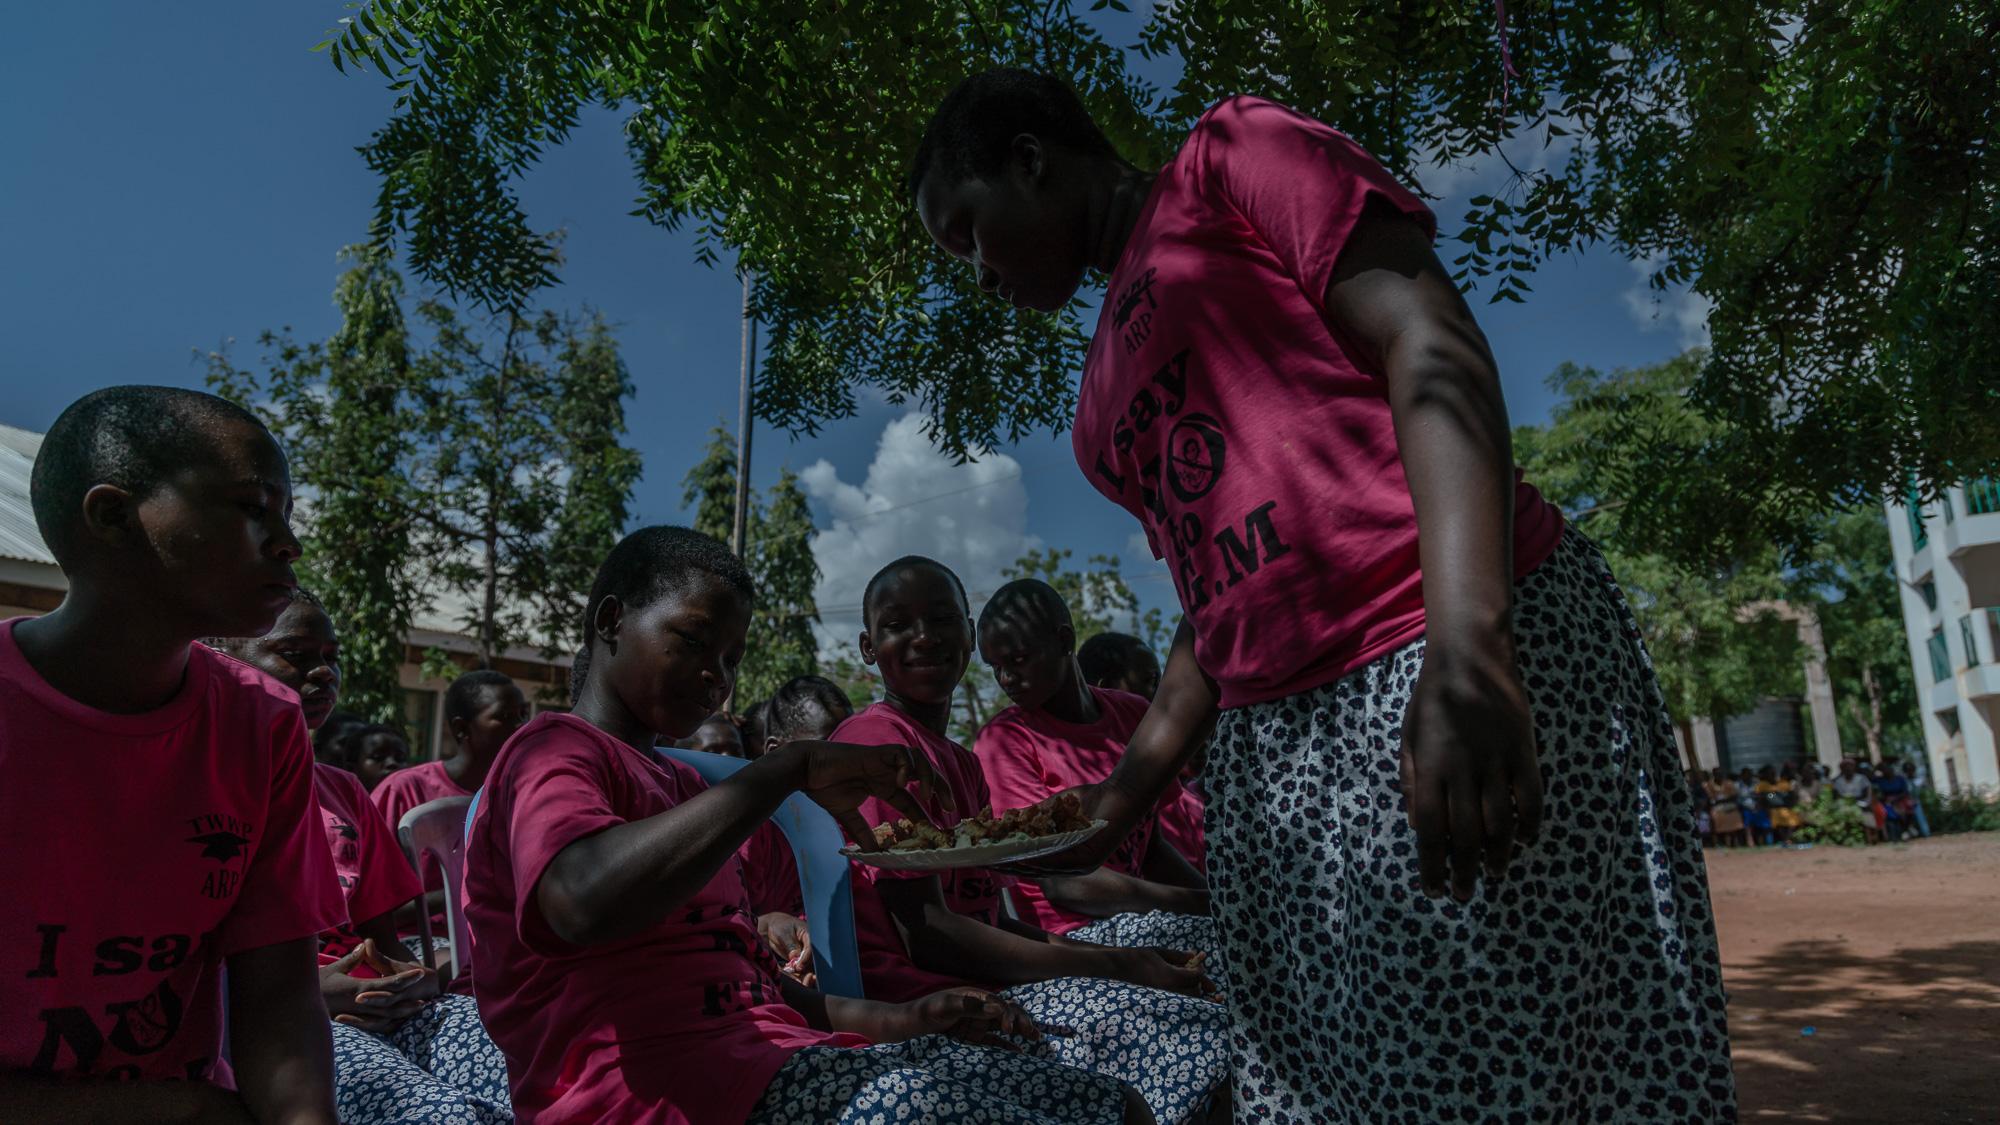 Adolescent girls attend an Alternative Rite of Passage Ceremony